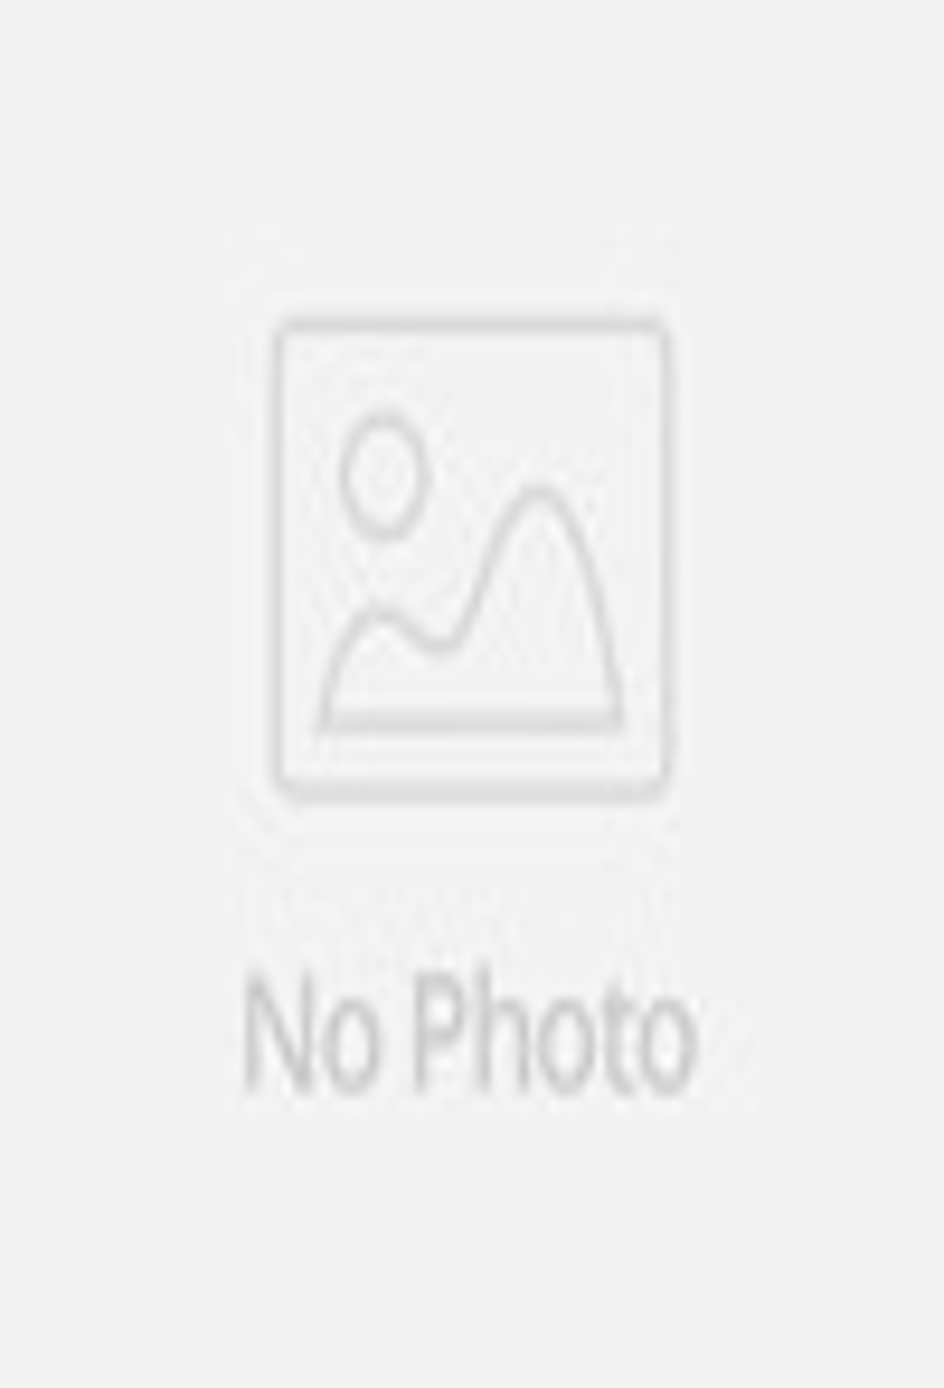 Alibaba.com Pakistani Designer Clothes BOLLYWOOD PAKISTANI DESIGNER N